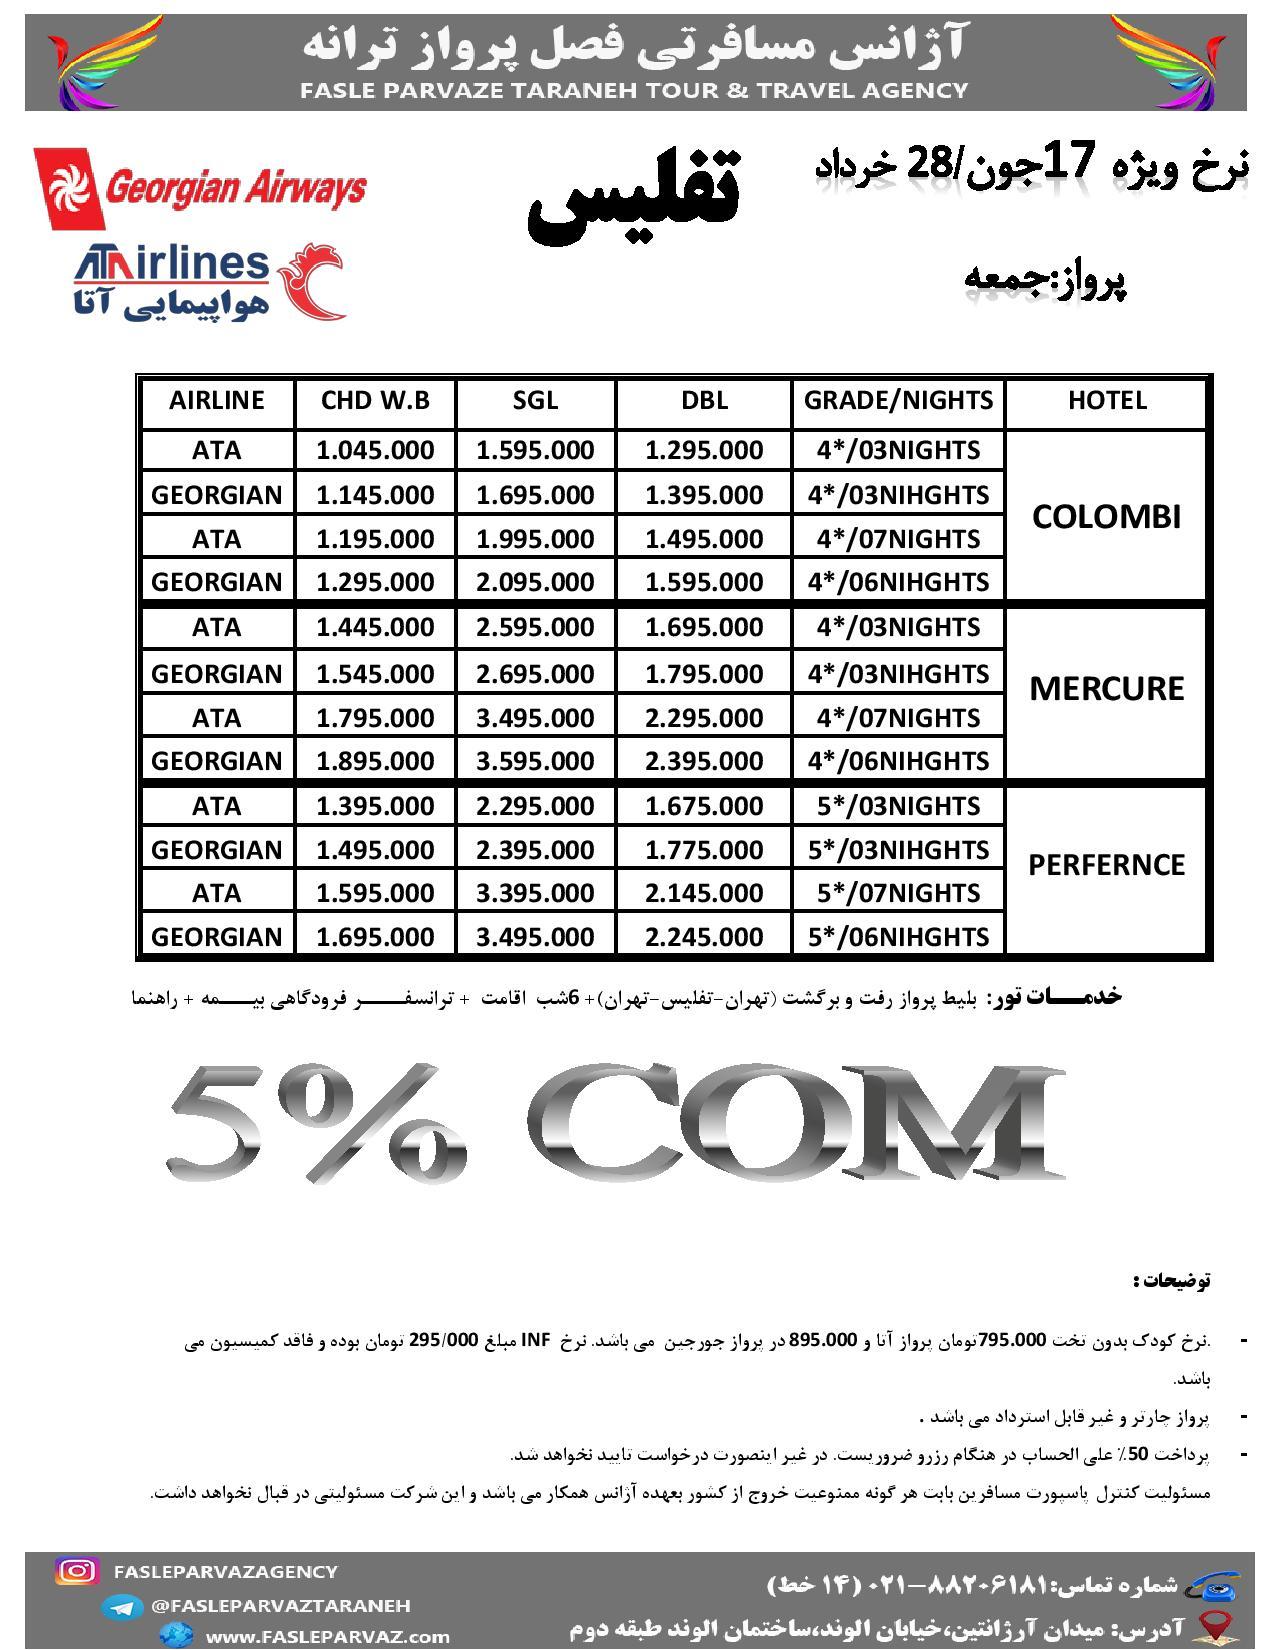 Document-page-001-6axaxa